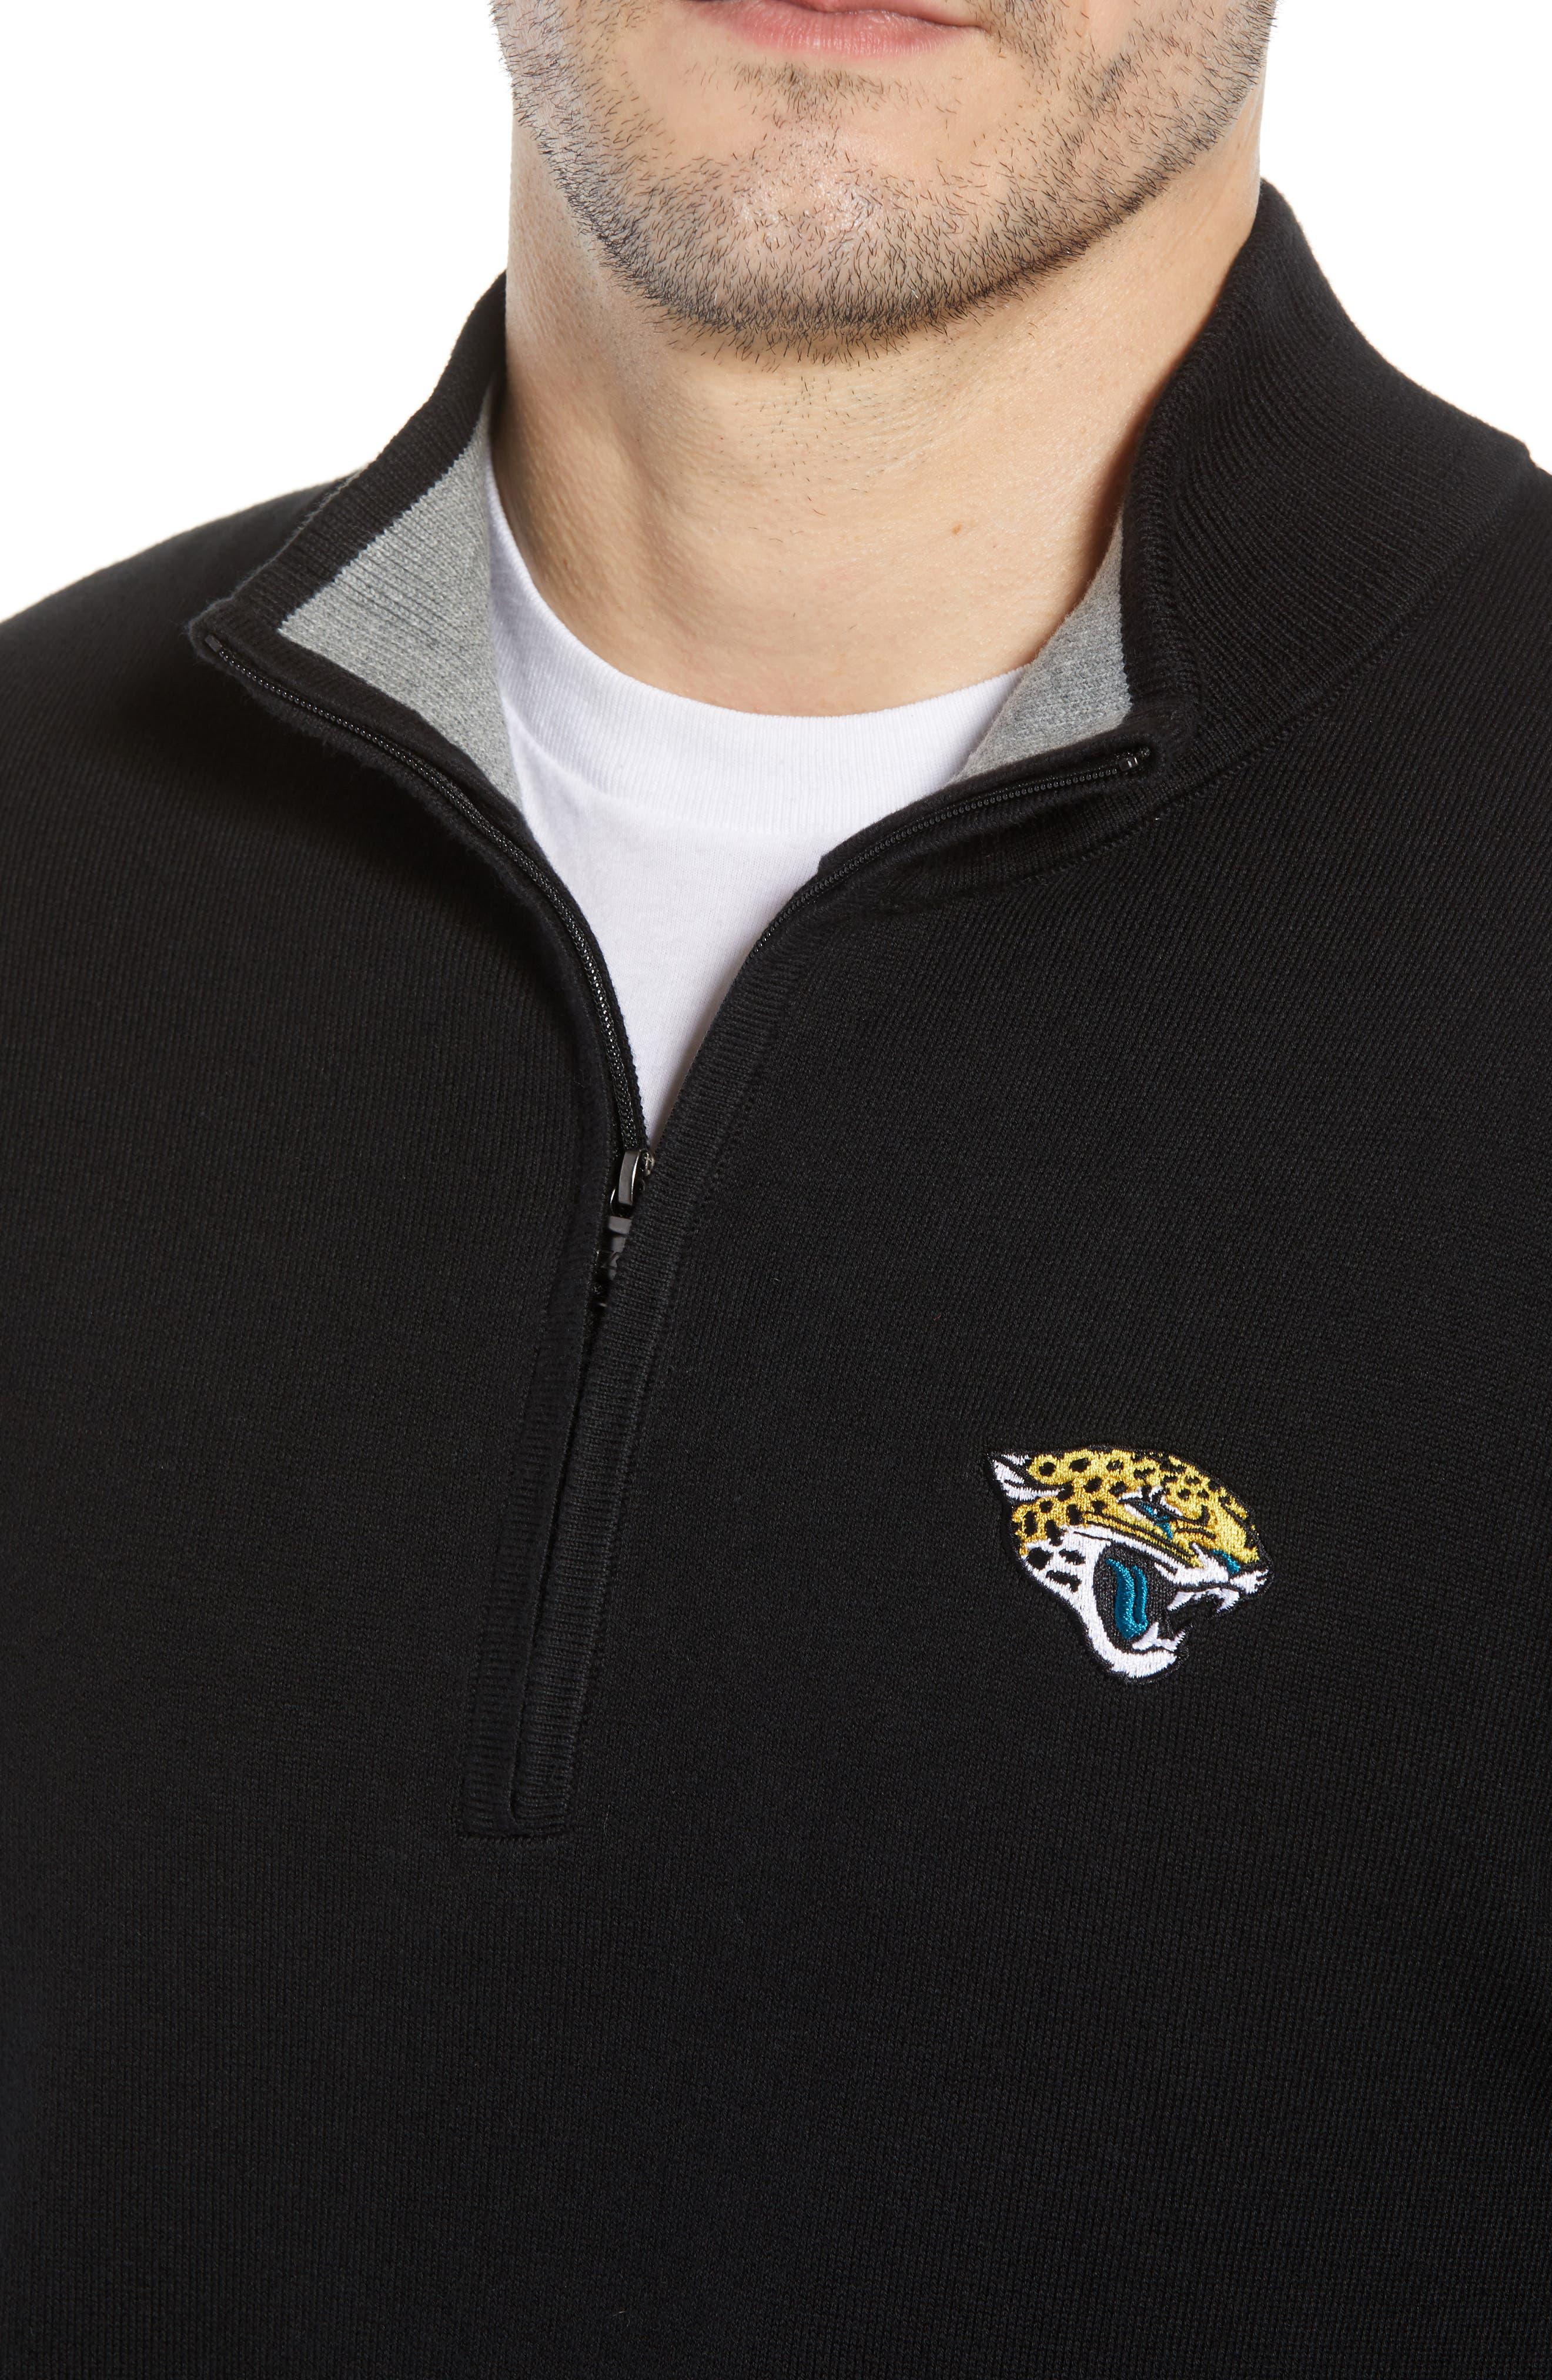 Jacksonville Jaguars - Lakemont Regular Fit Quarter Zip Sweater,                             Alternate thumbnail 4, color,                             BLACK